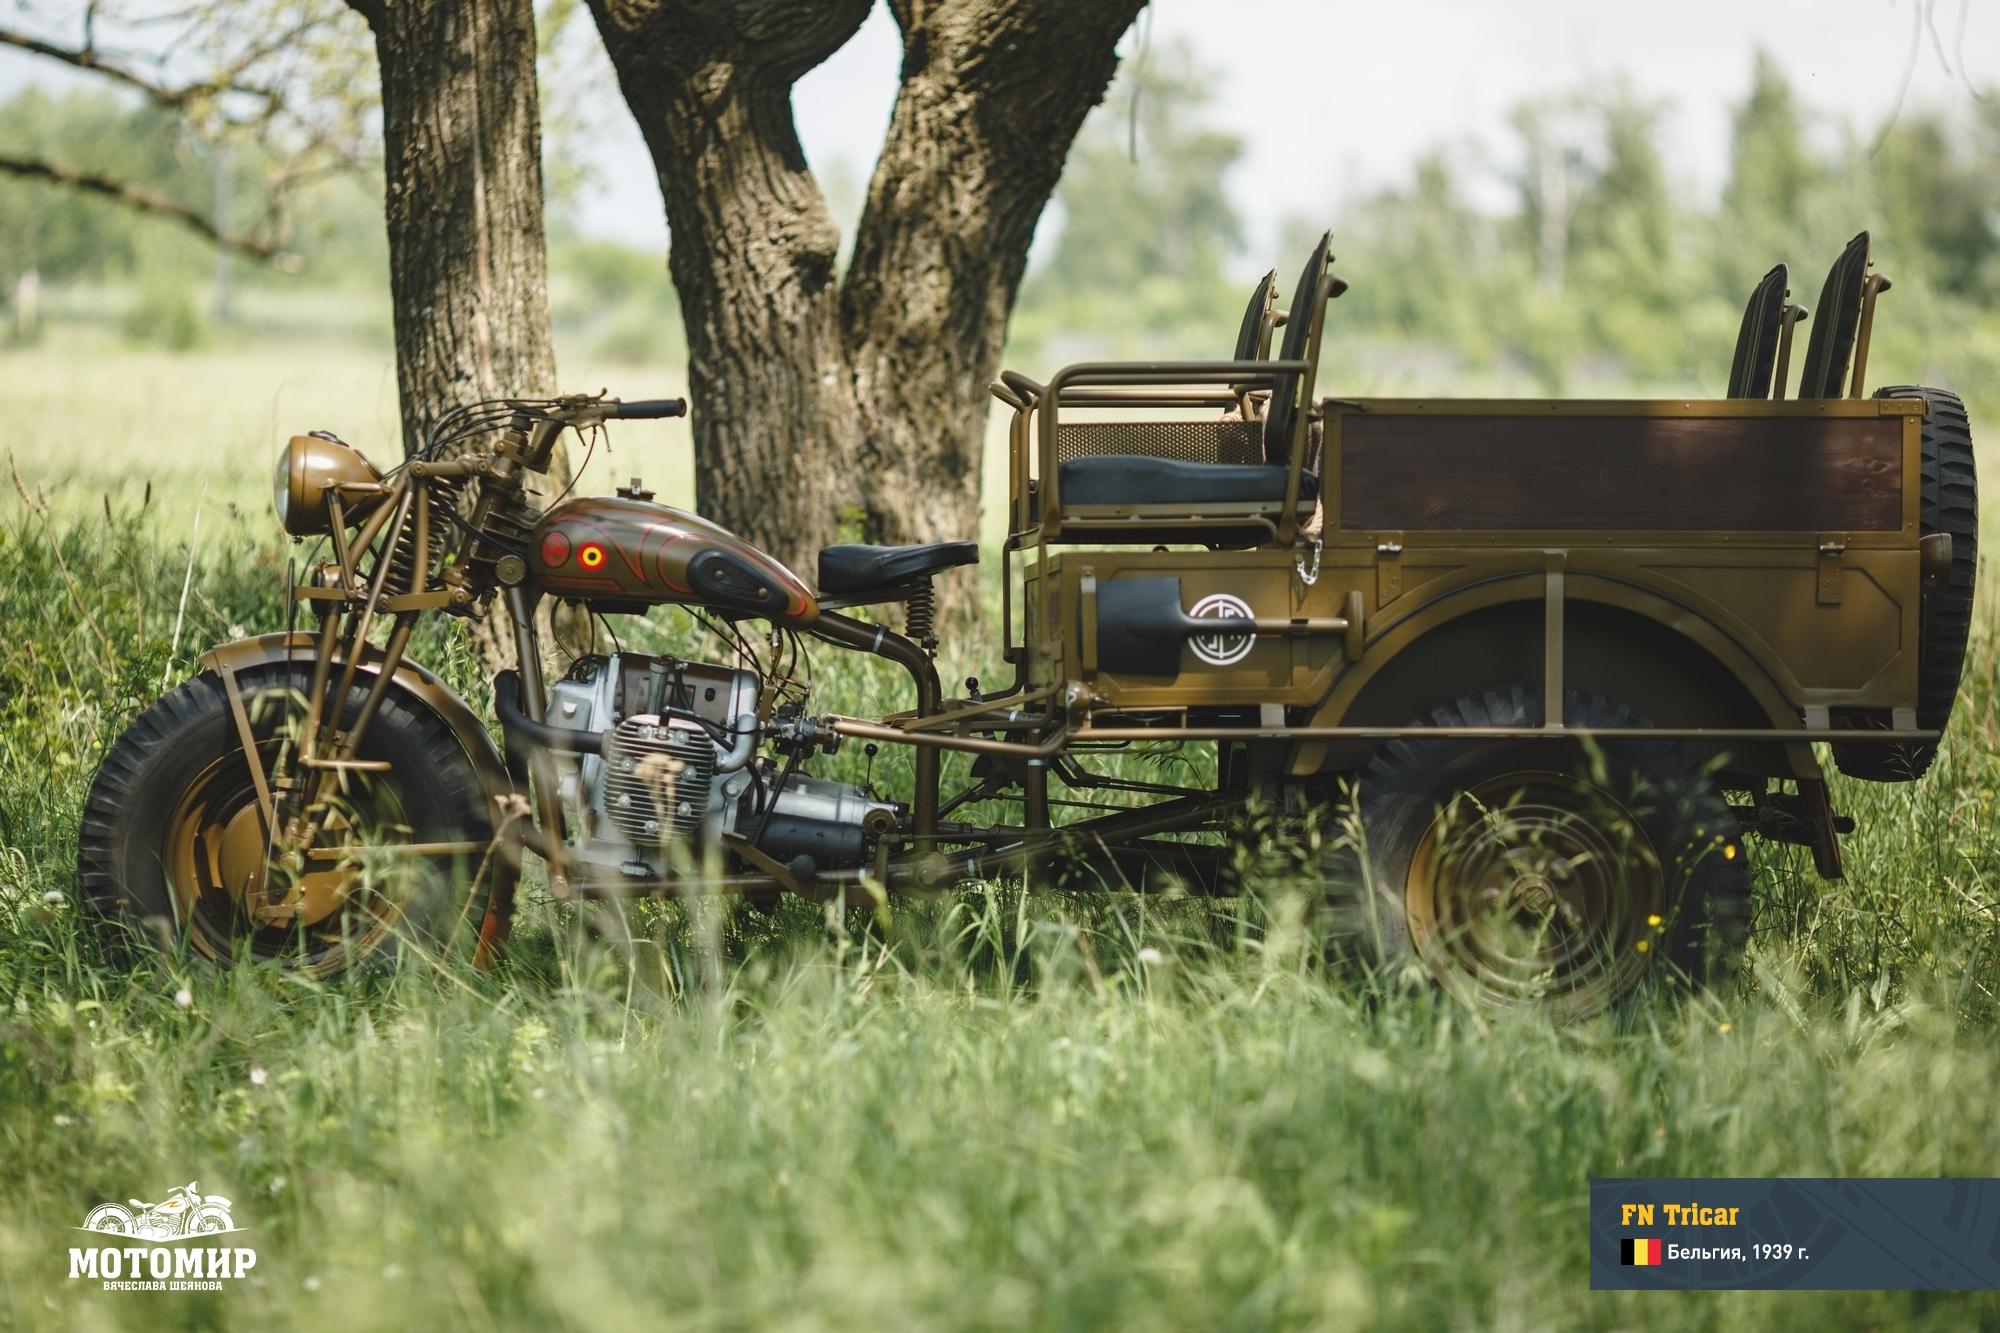 fn-tricar-201506-web-02